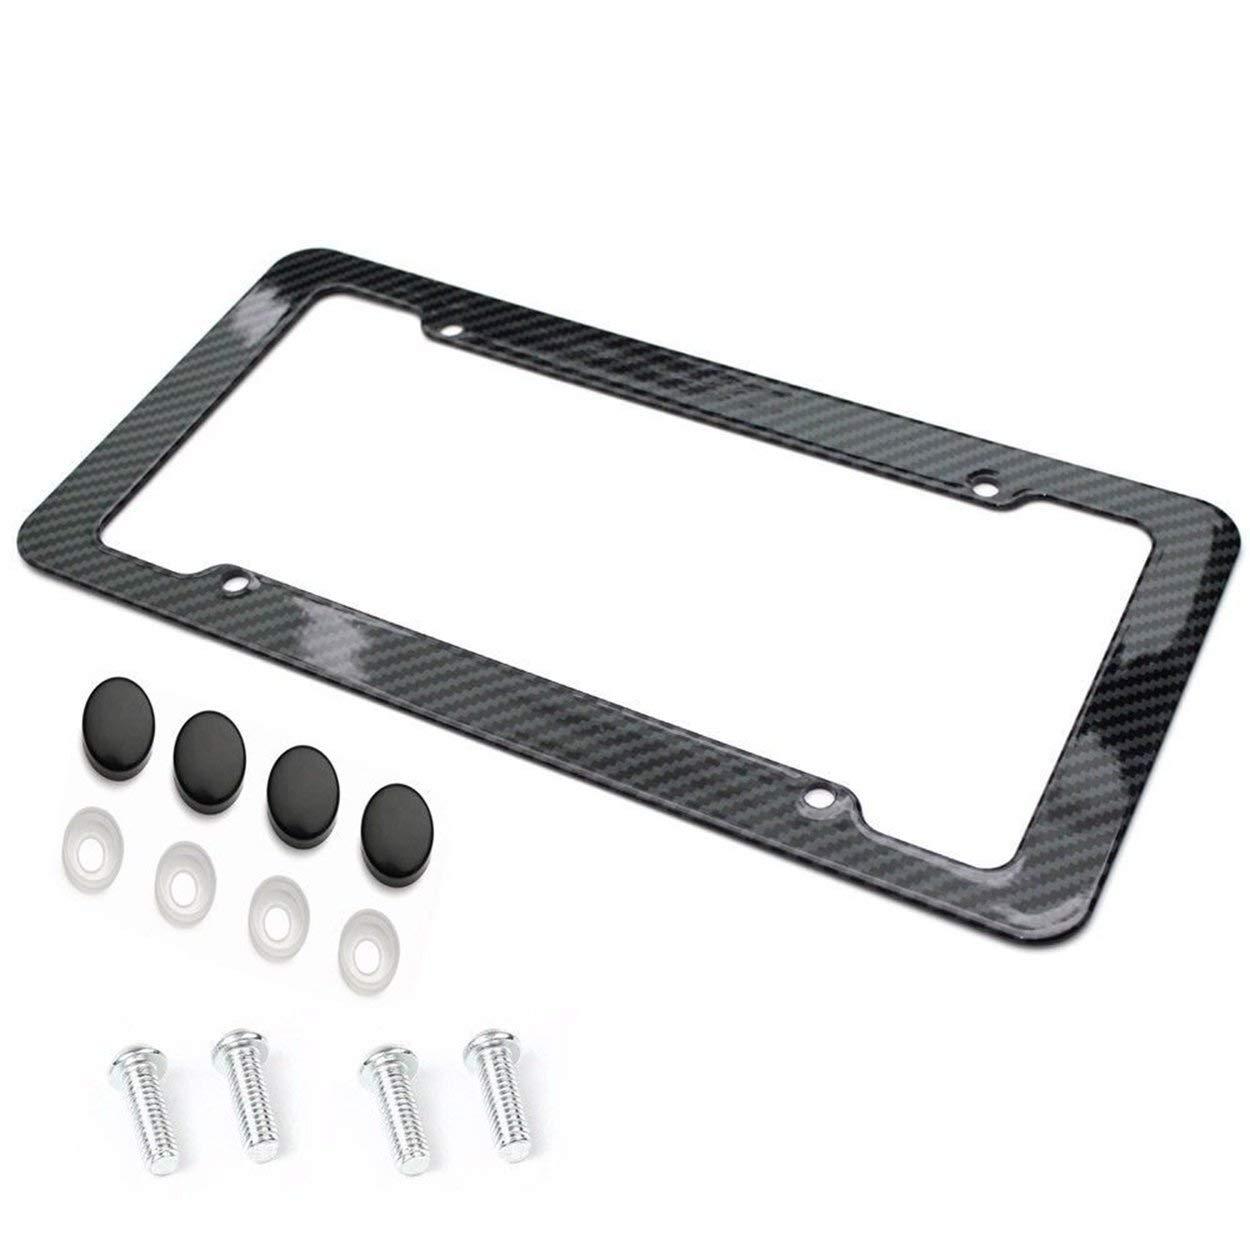 License Plate Frame Carbon Fiber Plastic License Plate Frame Bracket with Standard Screw Kits Universal Fit for Cars